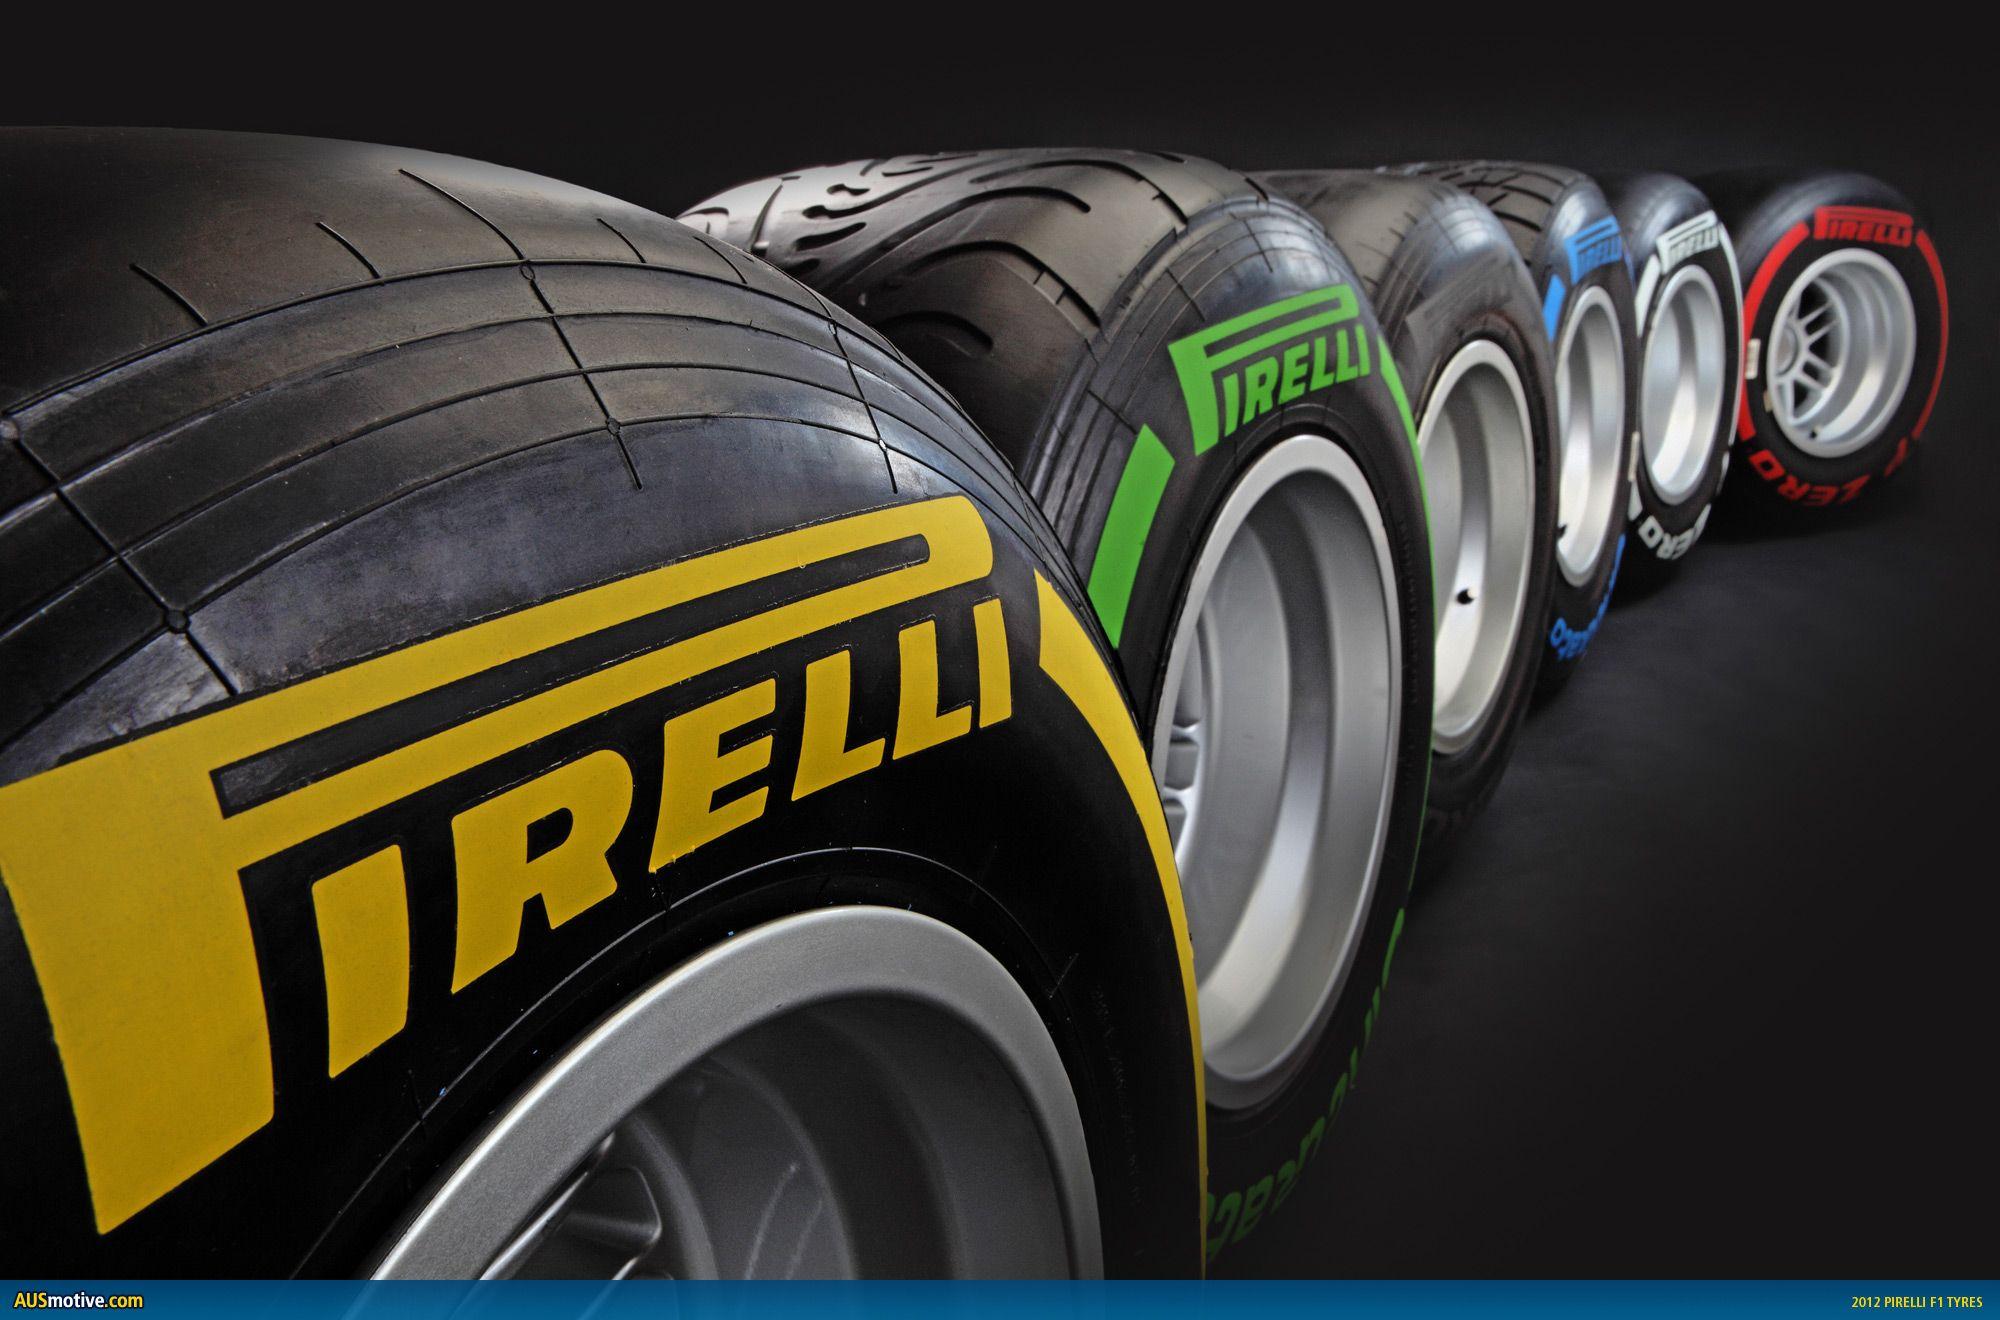 2012 F1 Pirelli Tyre Colours Tyre Companies Pirelli Car Tires